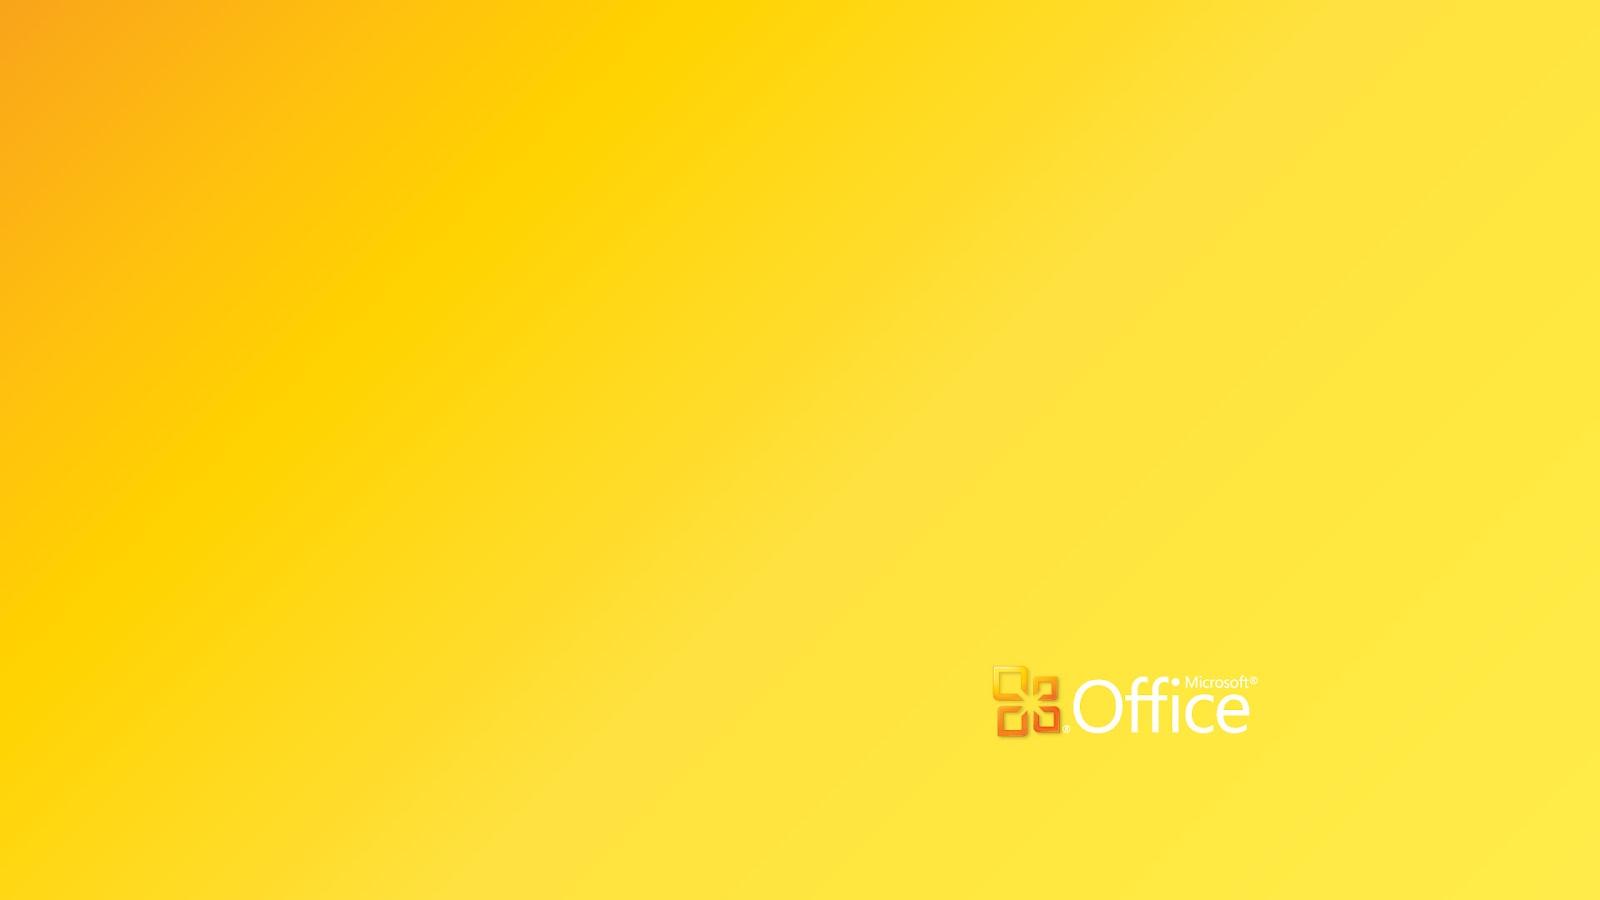 Microsoft Office Wallpaper 11